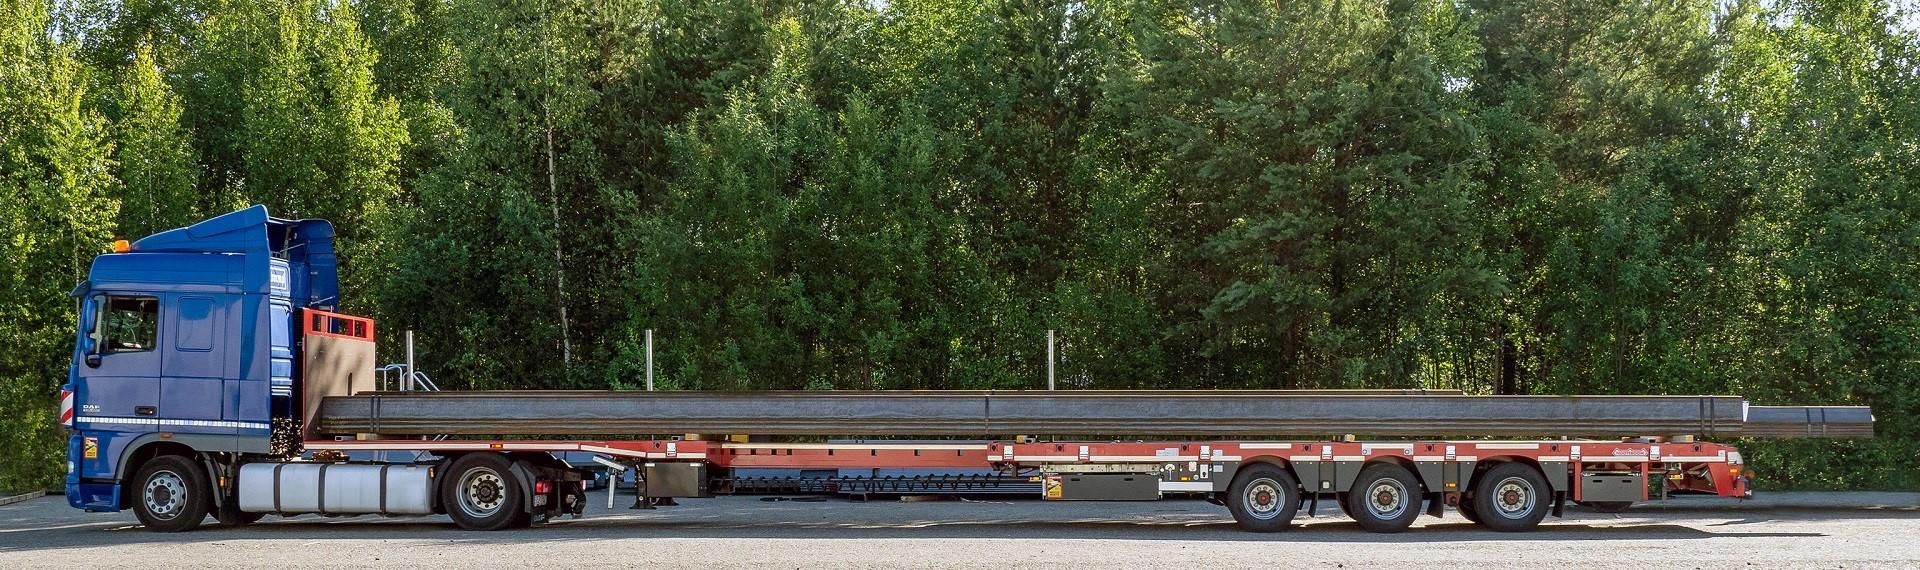 18 m long open profiles on a truck